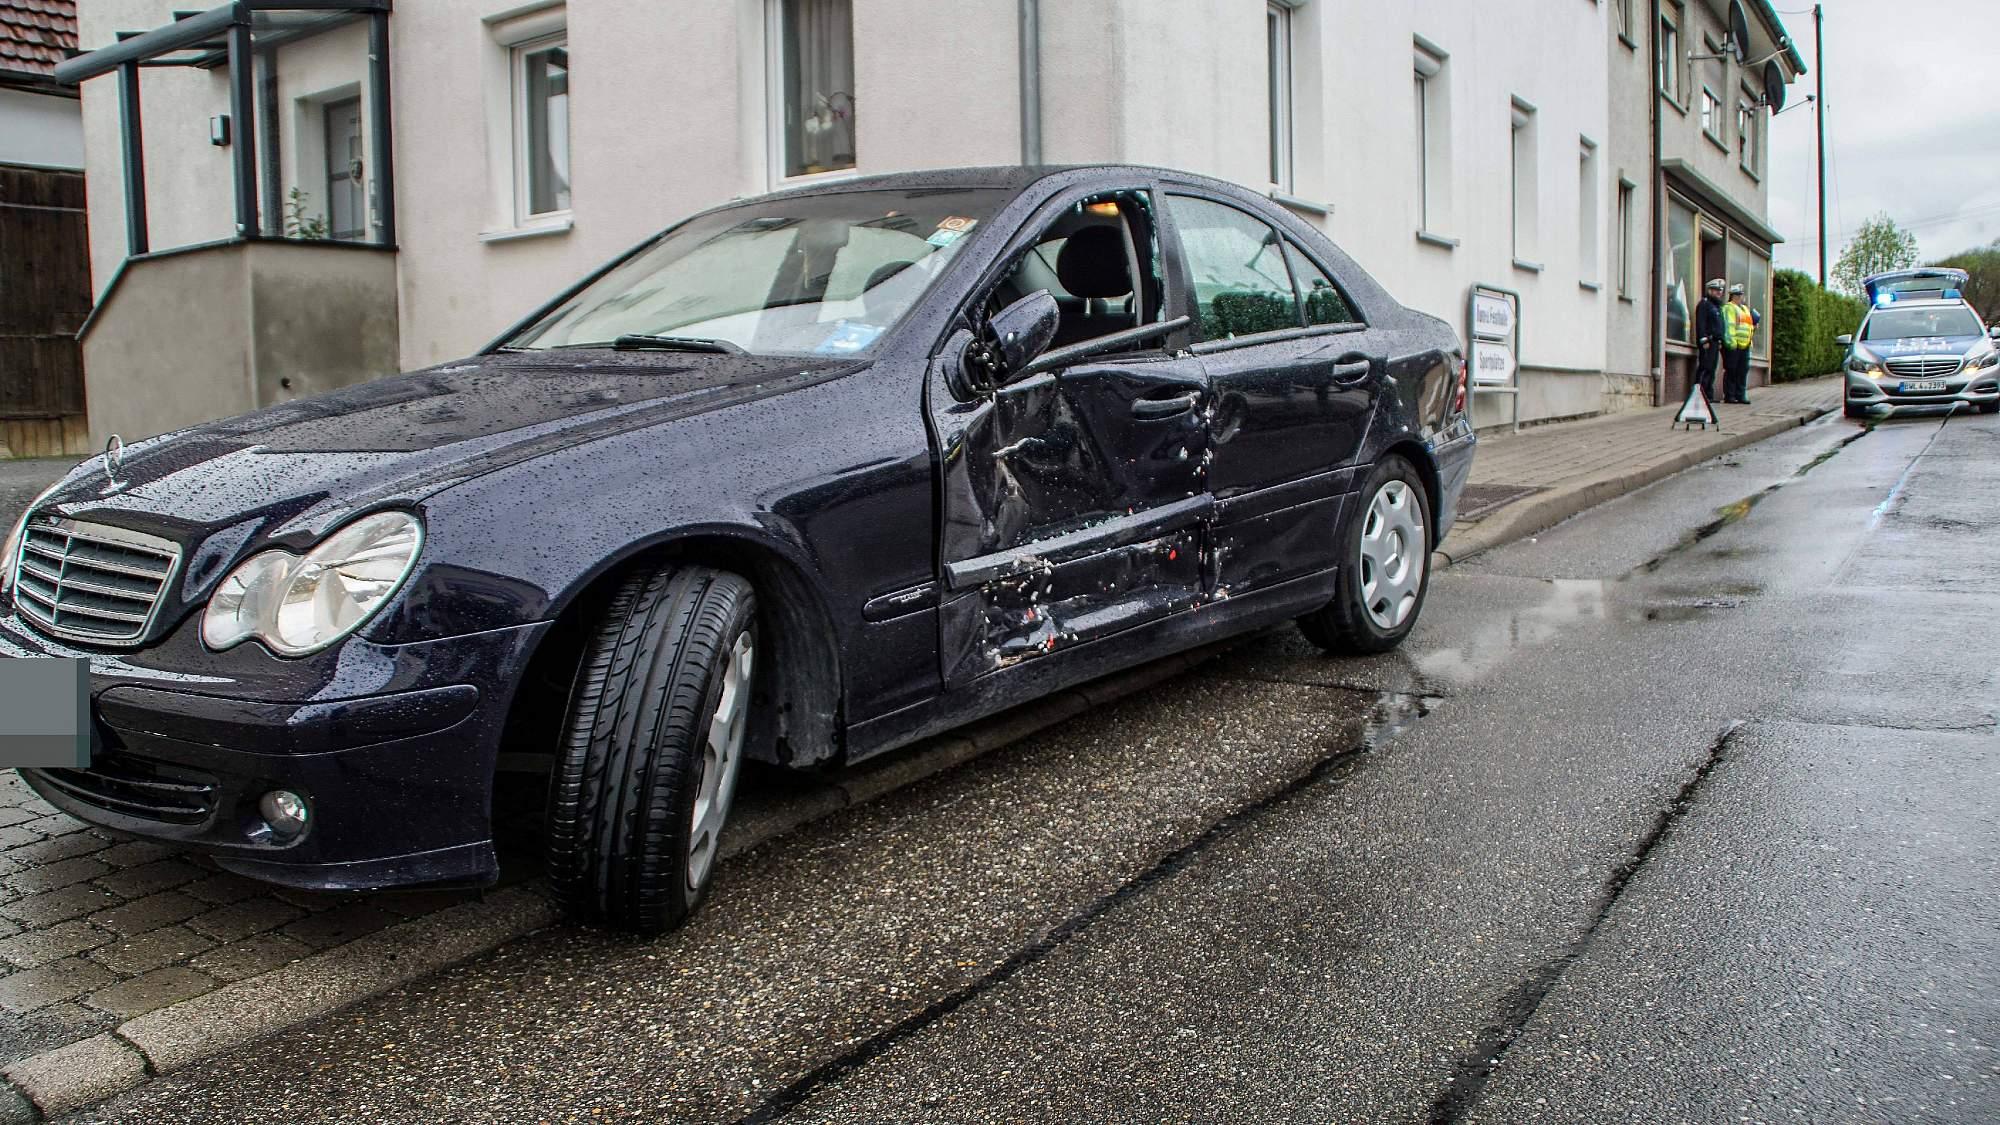 Bb Heute Magstadt Mercedesfahrer Bersieht Bus